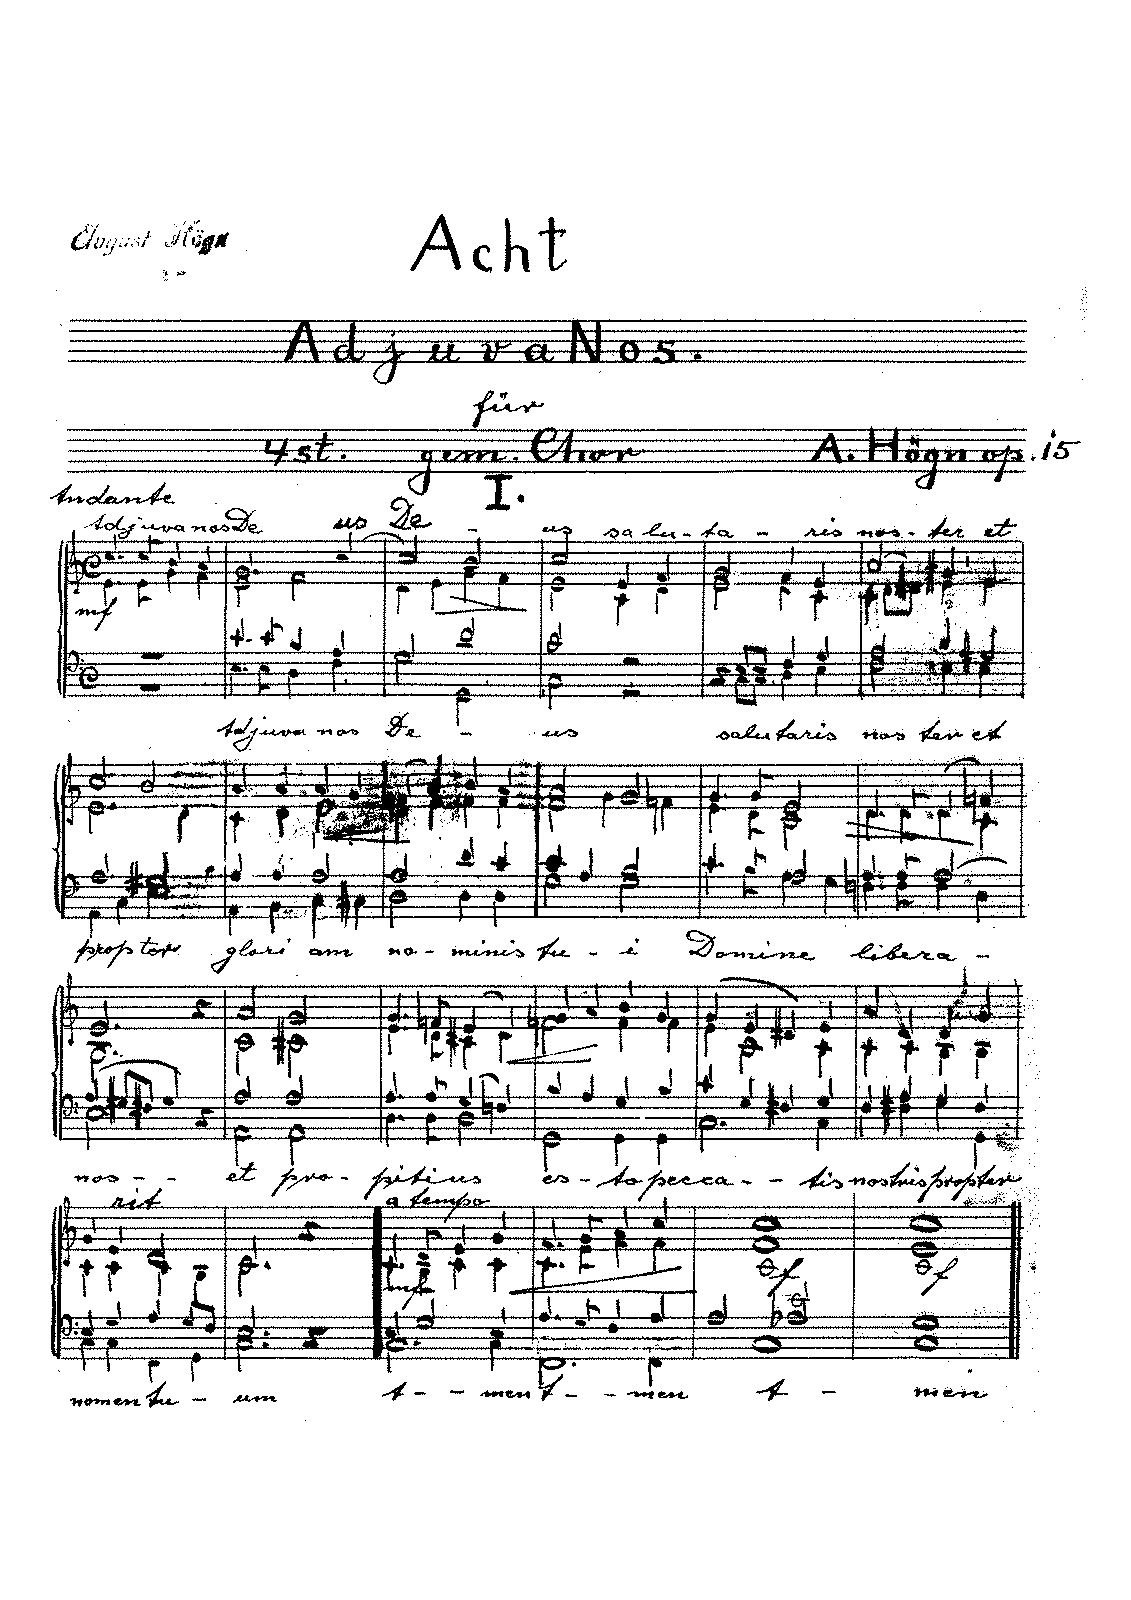 8 Adjuva nos, Op 15 (Högn, August) - IMSLP/Petrucci Music Library